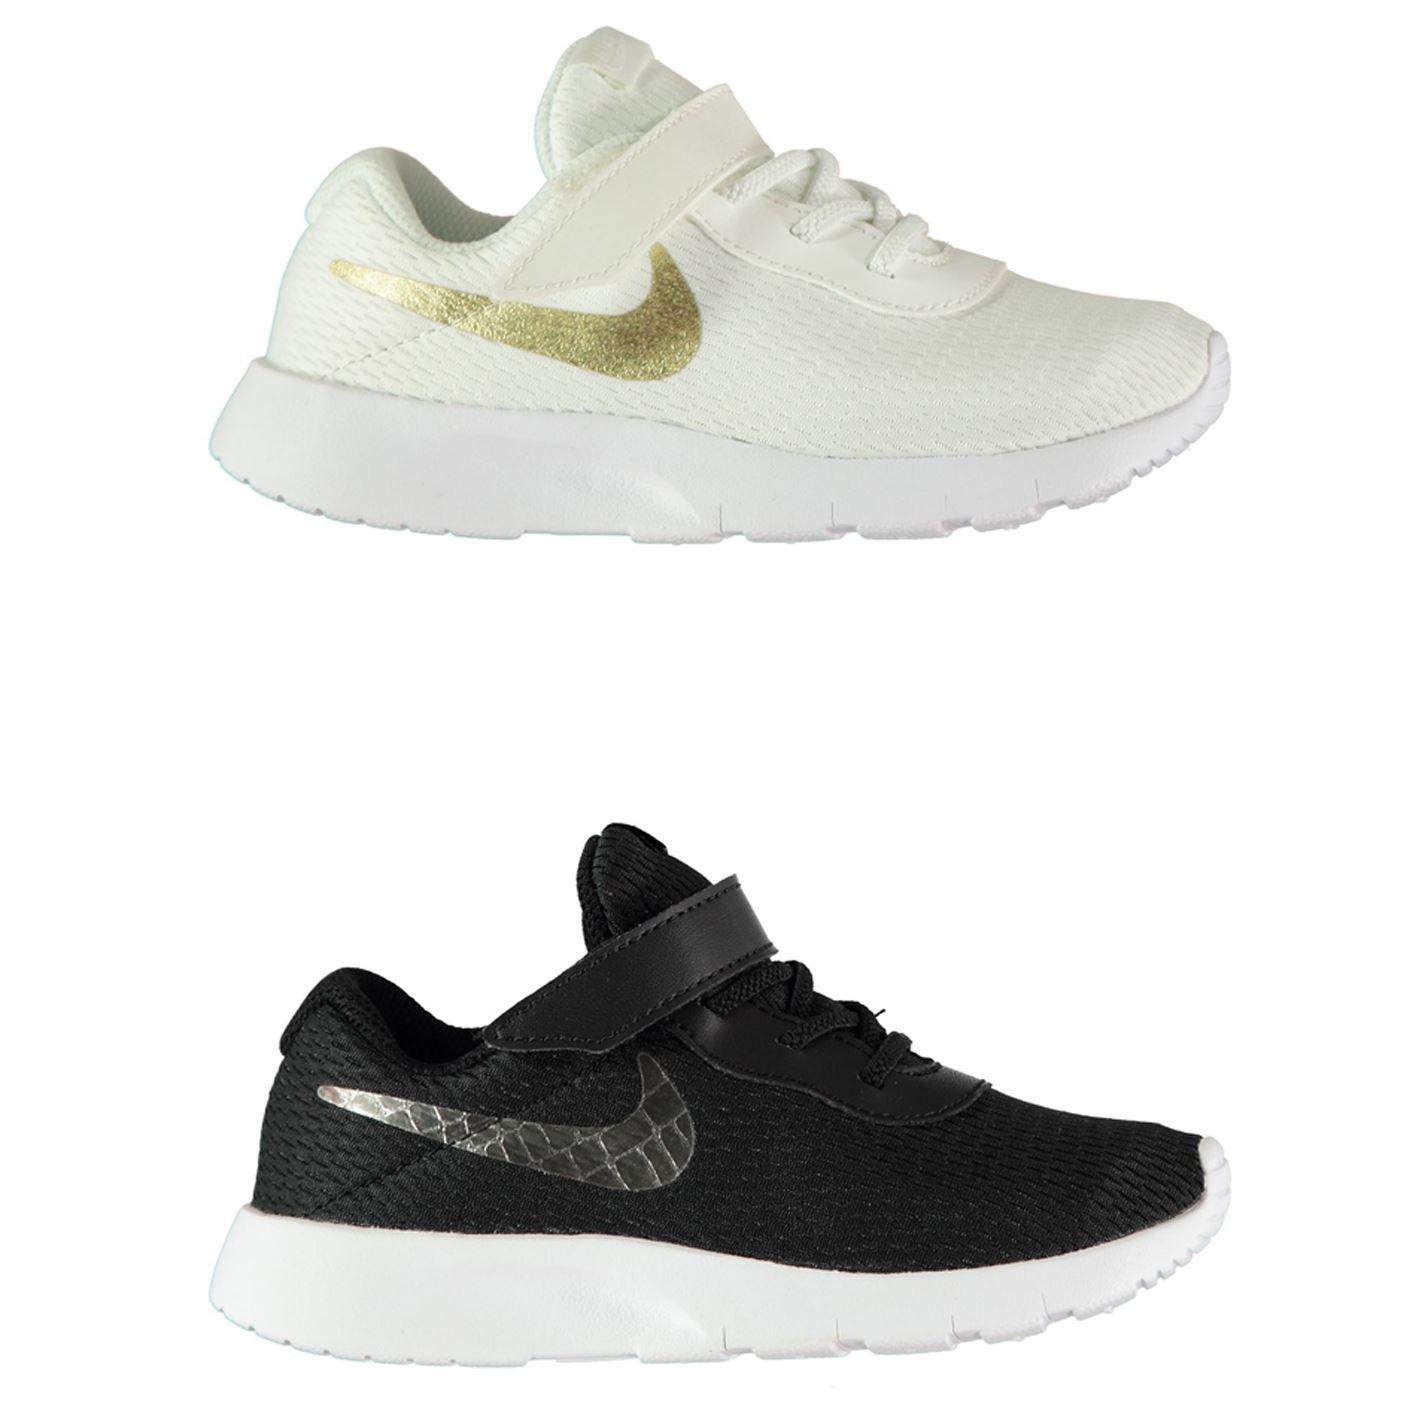 2528312fcd6 Nike Tanjun Shoes Infant Girls Trainers Footwear Nike Tanjun Shoes Infant  Girls Trainers Footwear ...